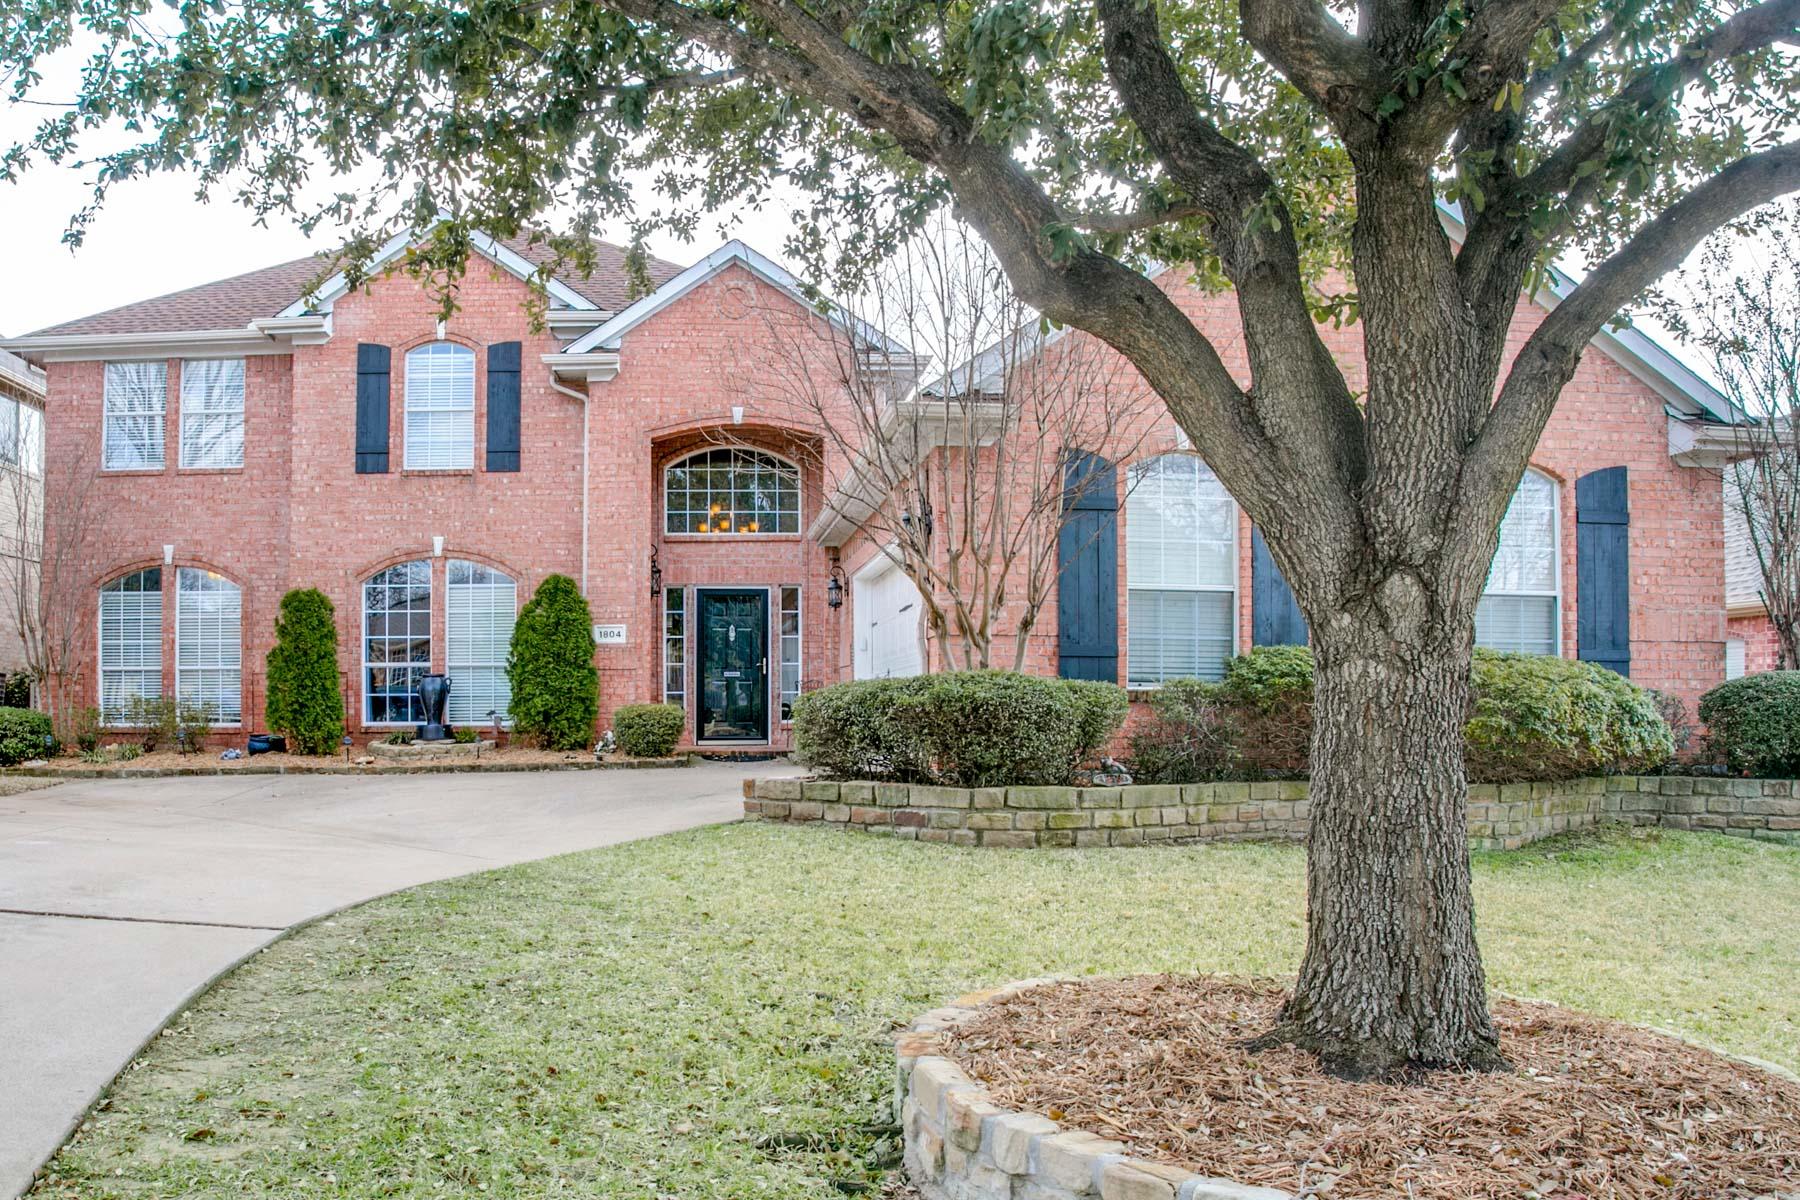 Single Family Home for Sale at 1804 Paddington Court 1804 Paddington Court Arlington, Texas 76017 United States